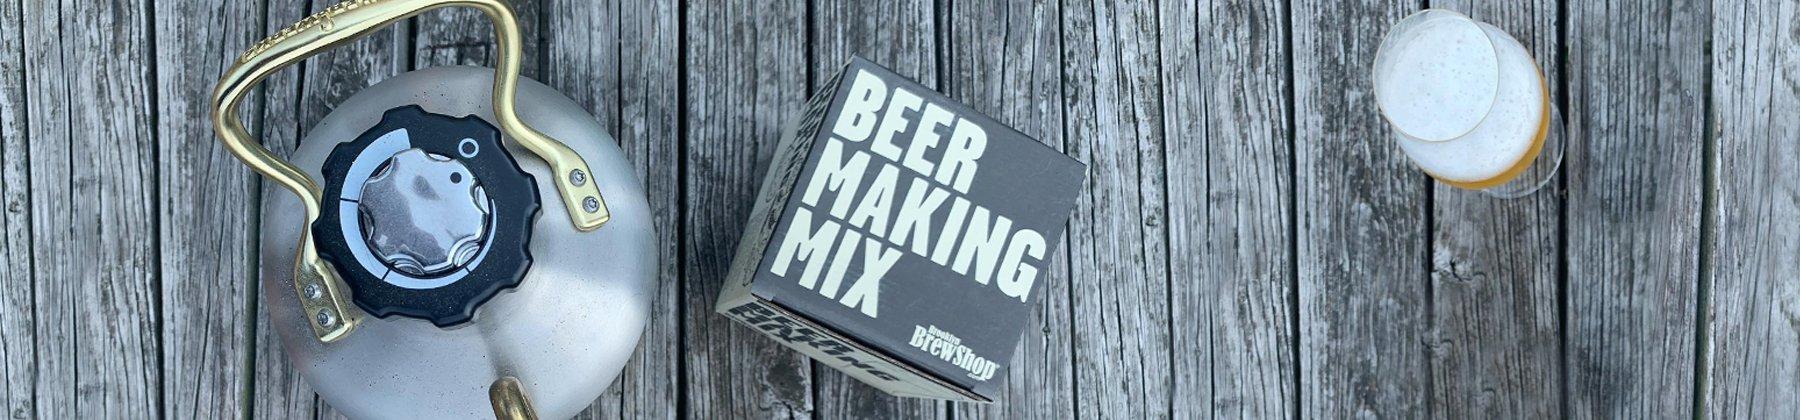 Photo of beer making kit.